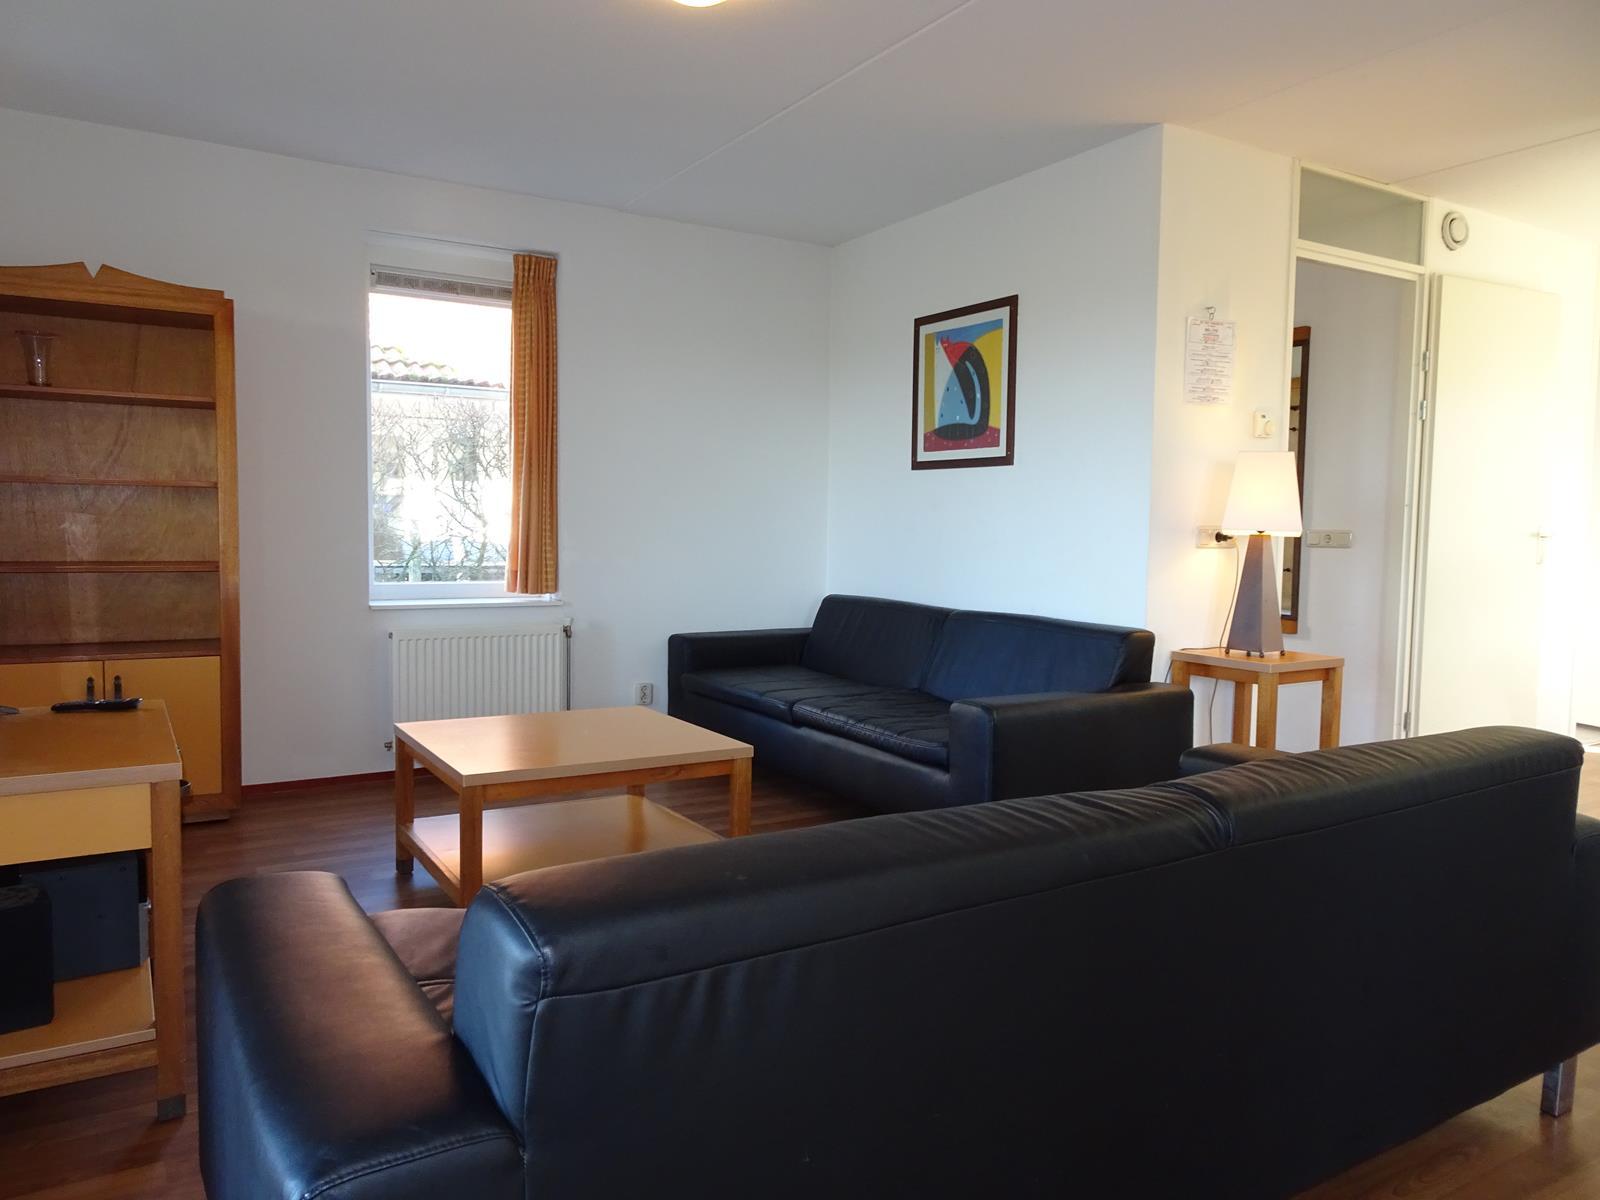 Vakantiehuis te koop Zeeland Bruinisse K155 (6).jpg